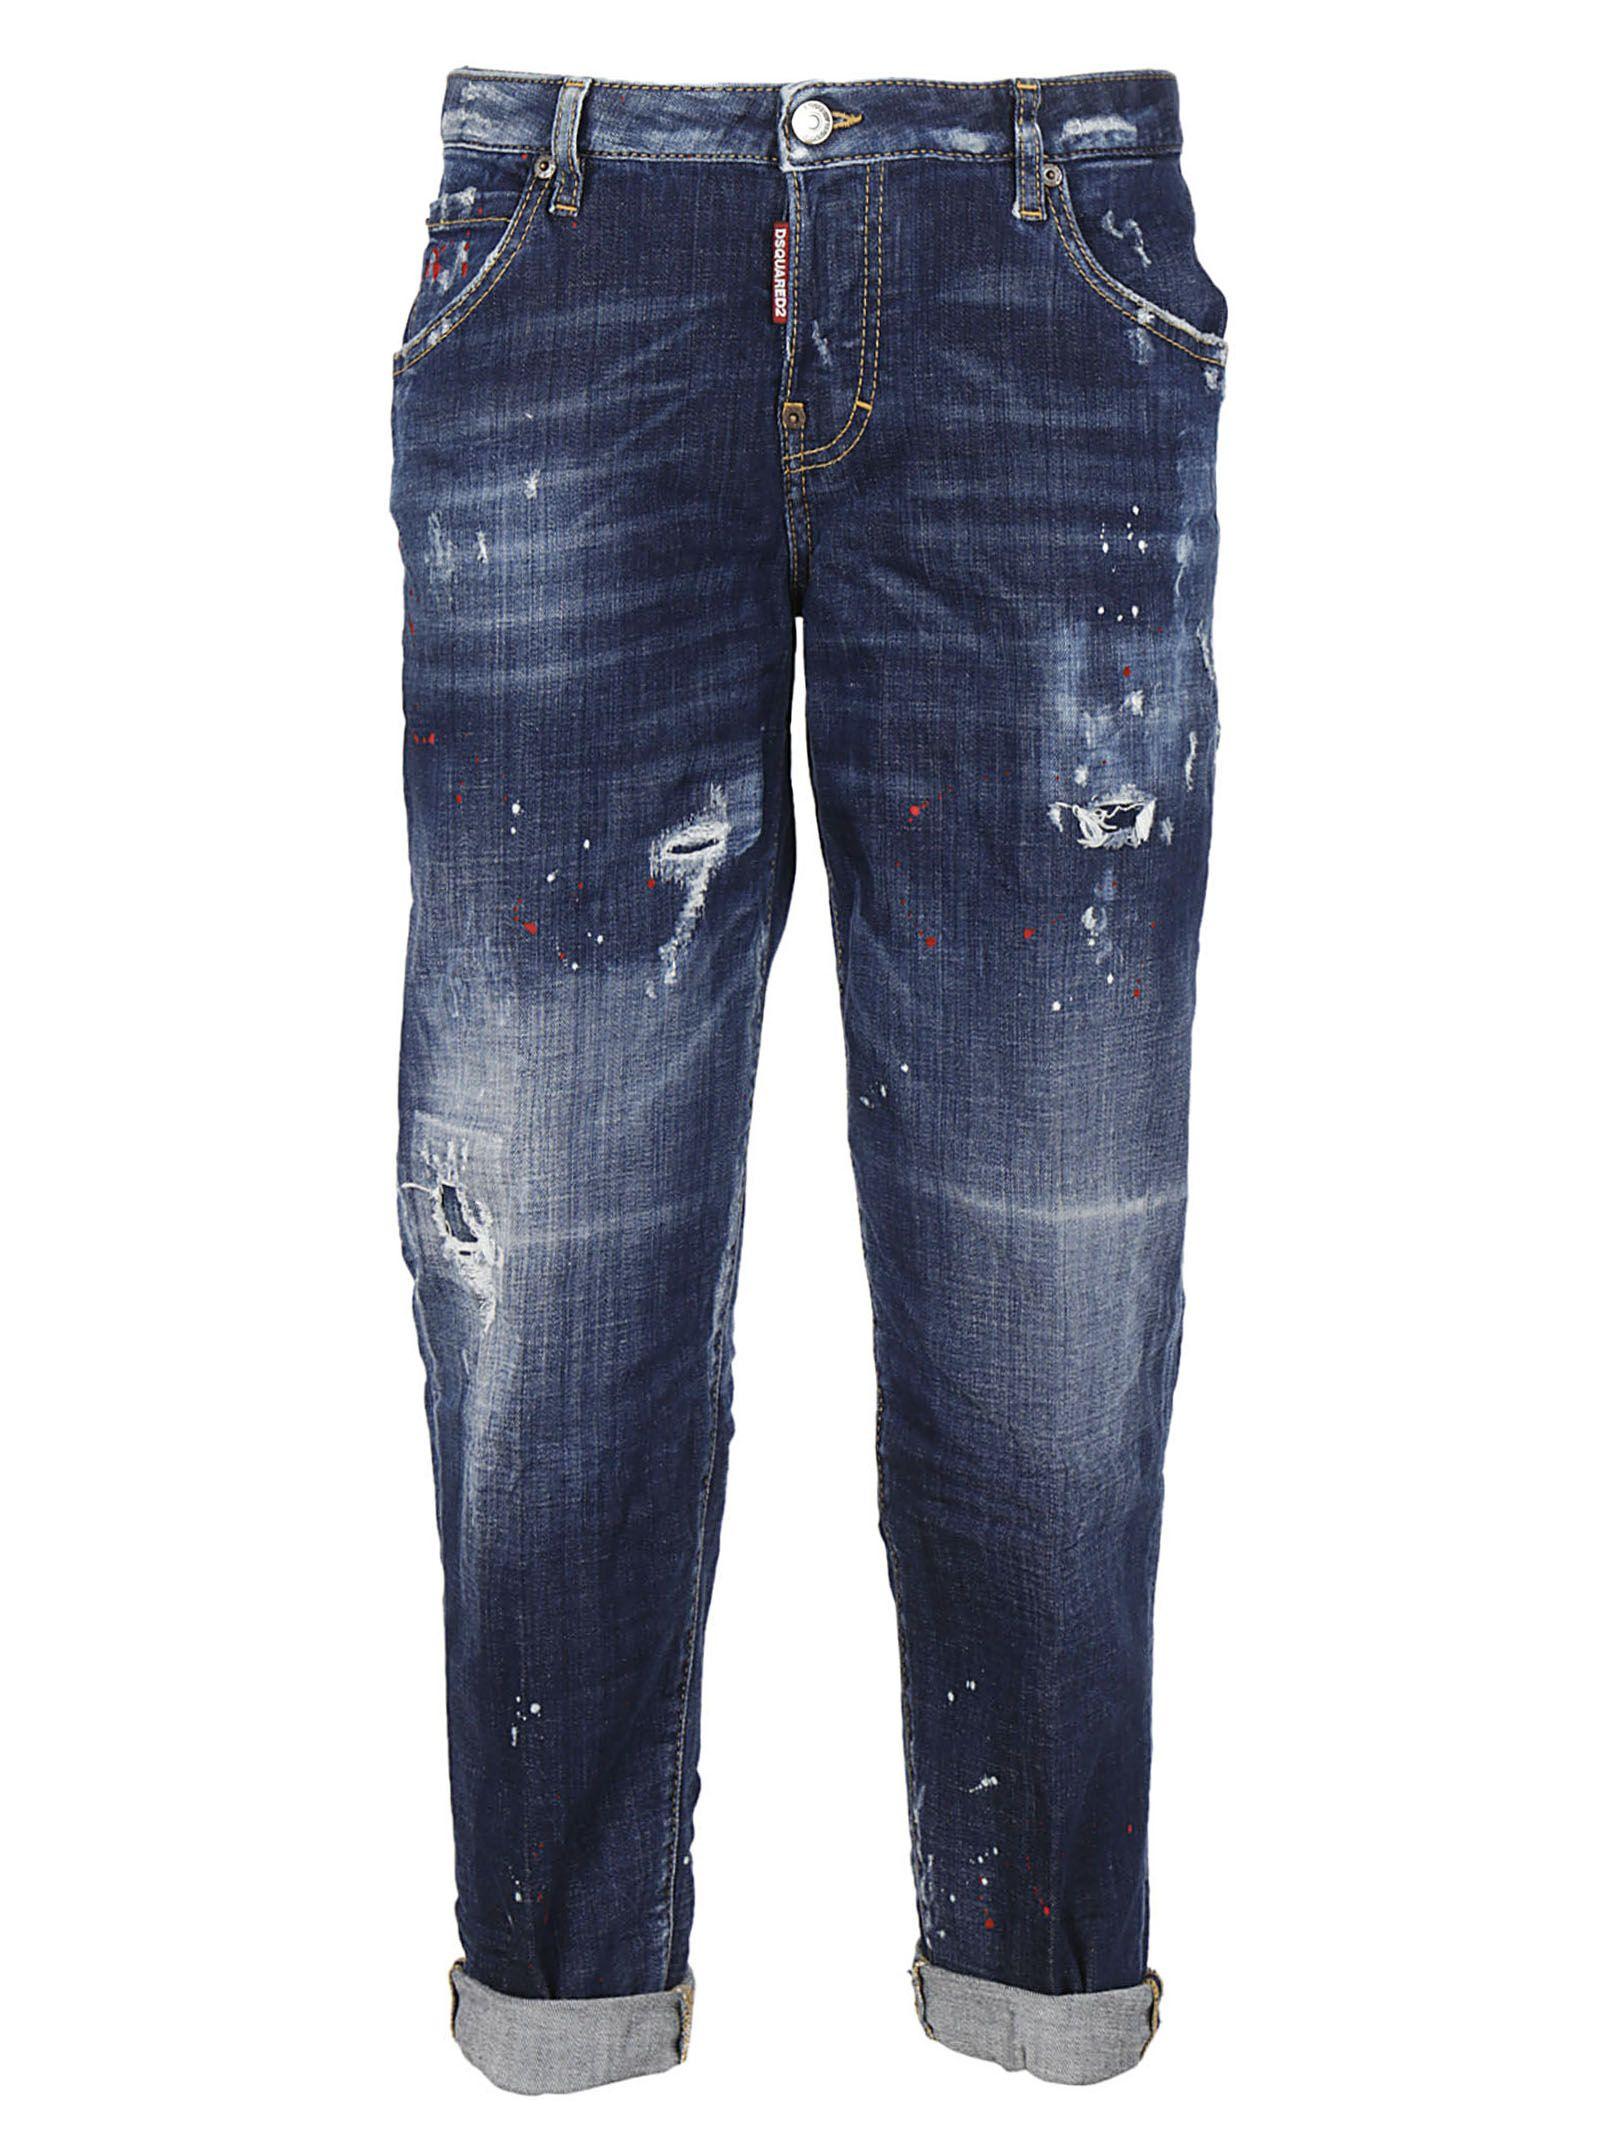 Dsquared2 Distressed Hockney Jeans